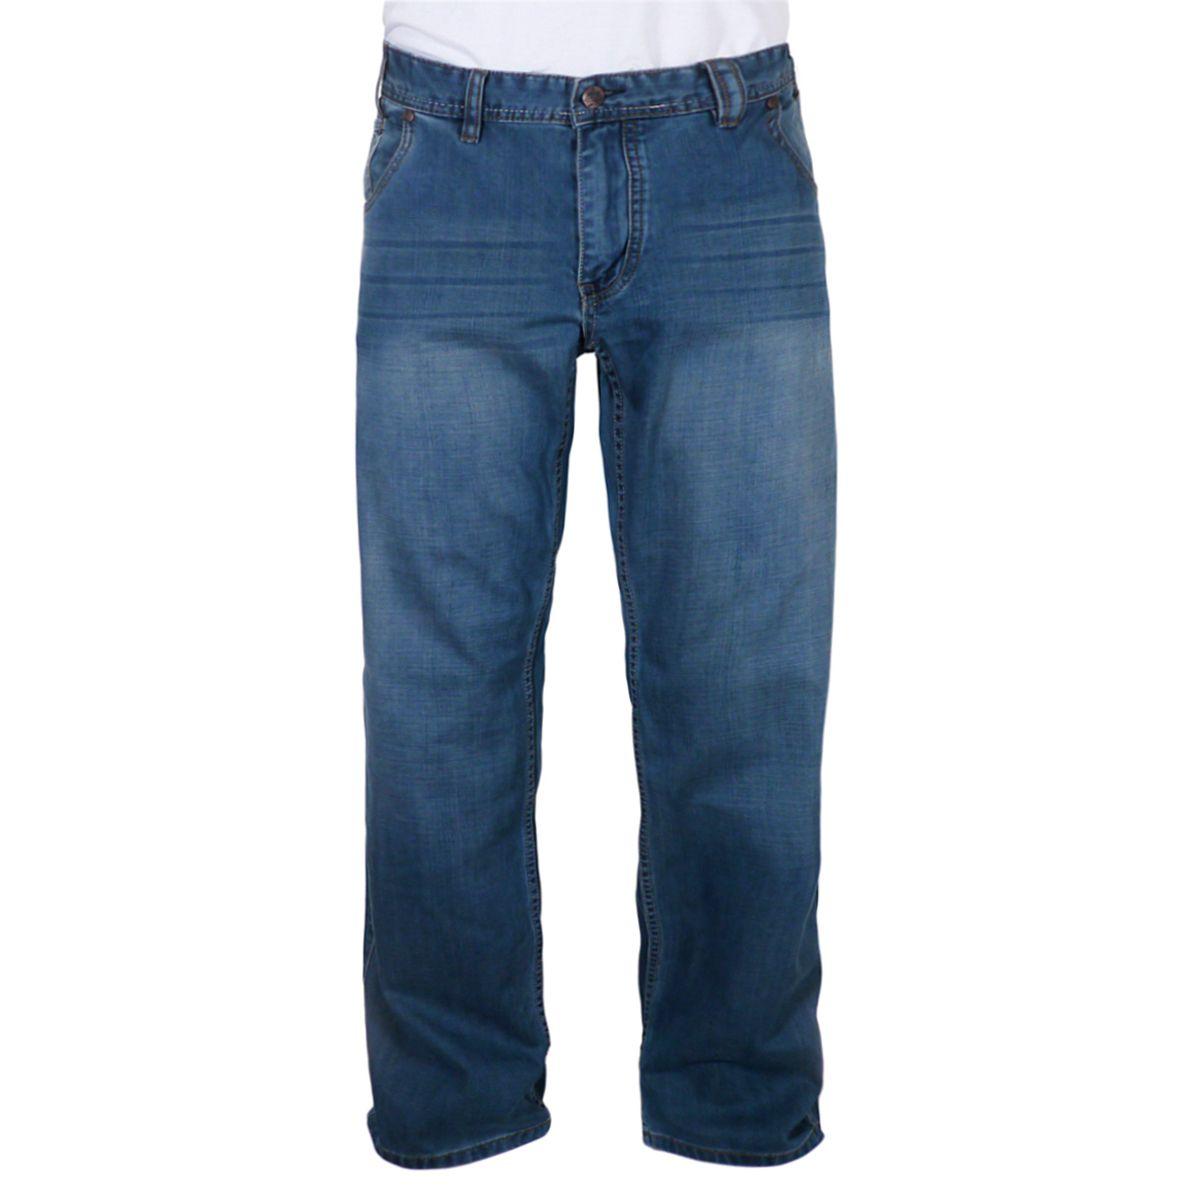 jeans bleu d lav taille basse grande taille jusqu 39 au 68fr 54us size factory replika. Black Bedroom Furniture Sets. Home Design Ideas